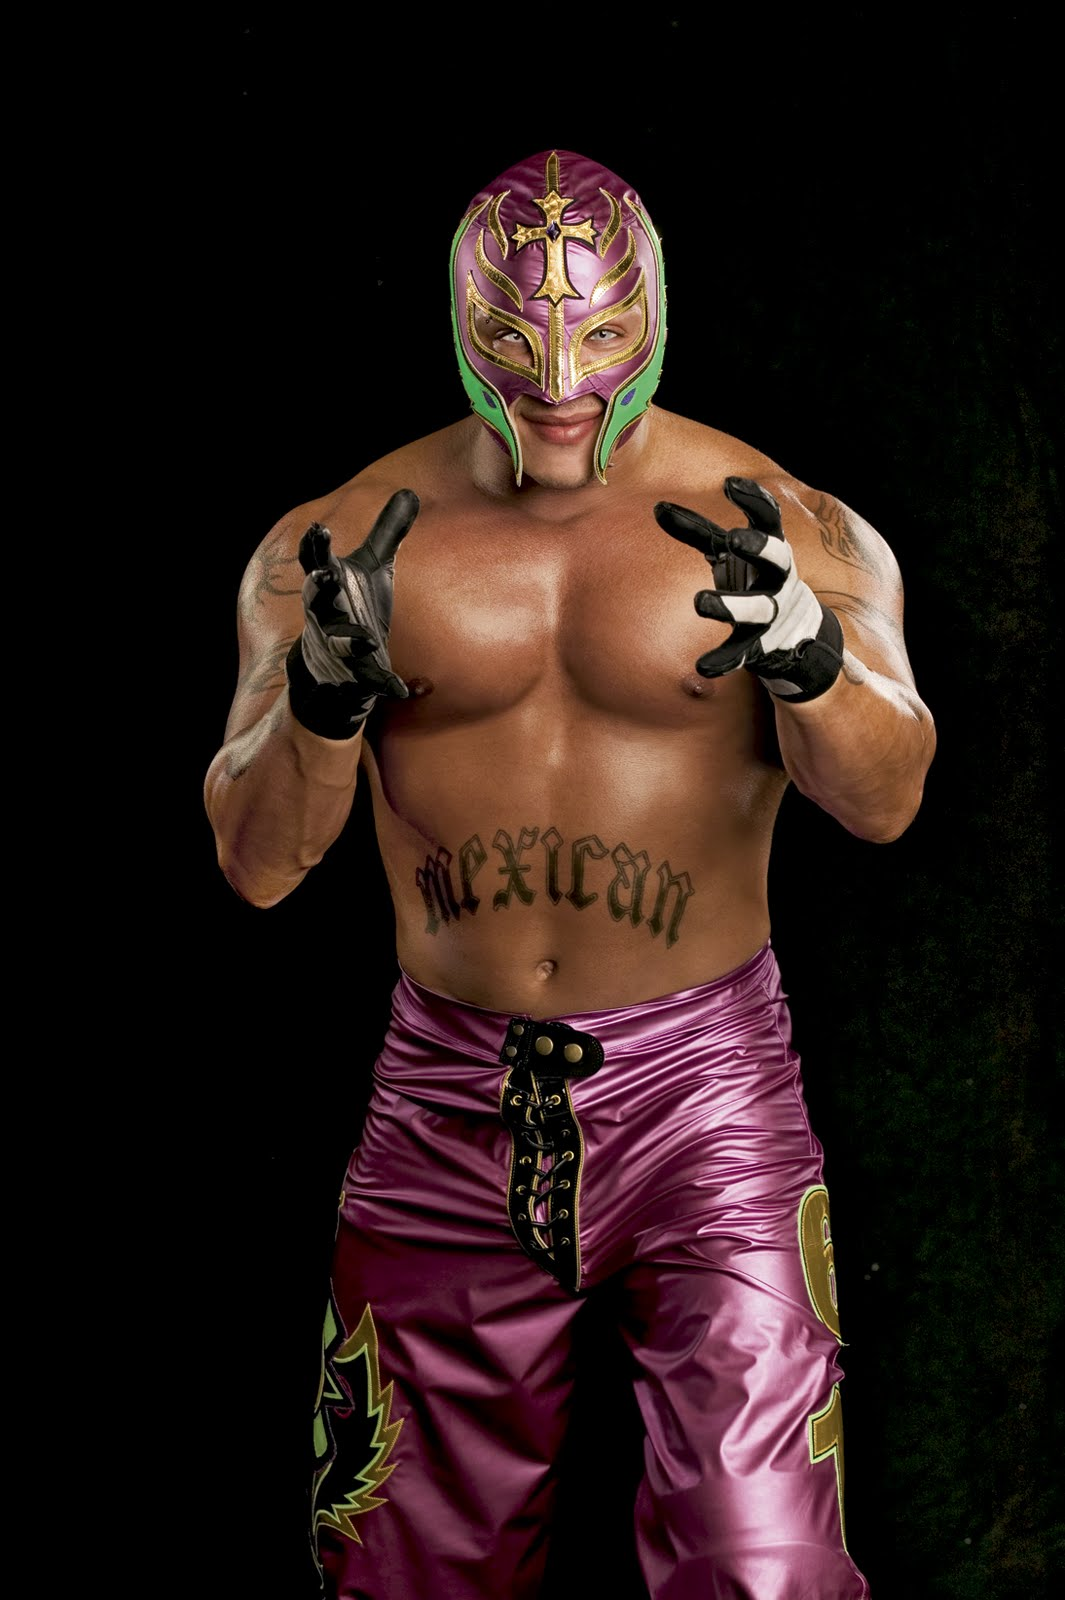 Sports celebrity rey mysterio wrestling player for Rey mysterio tattoos